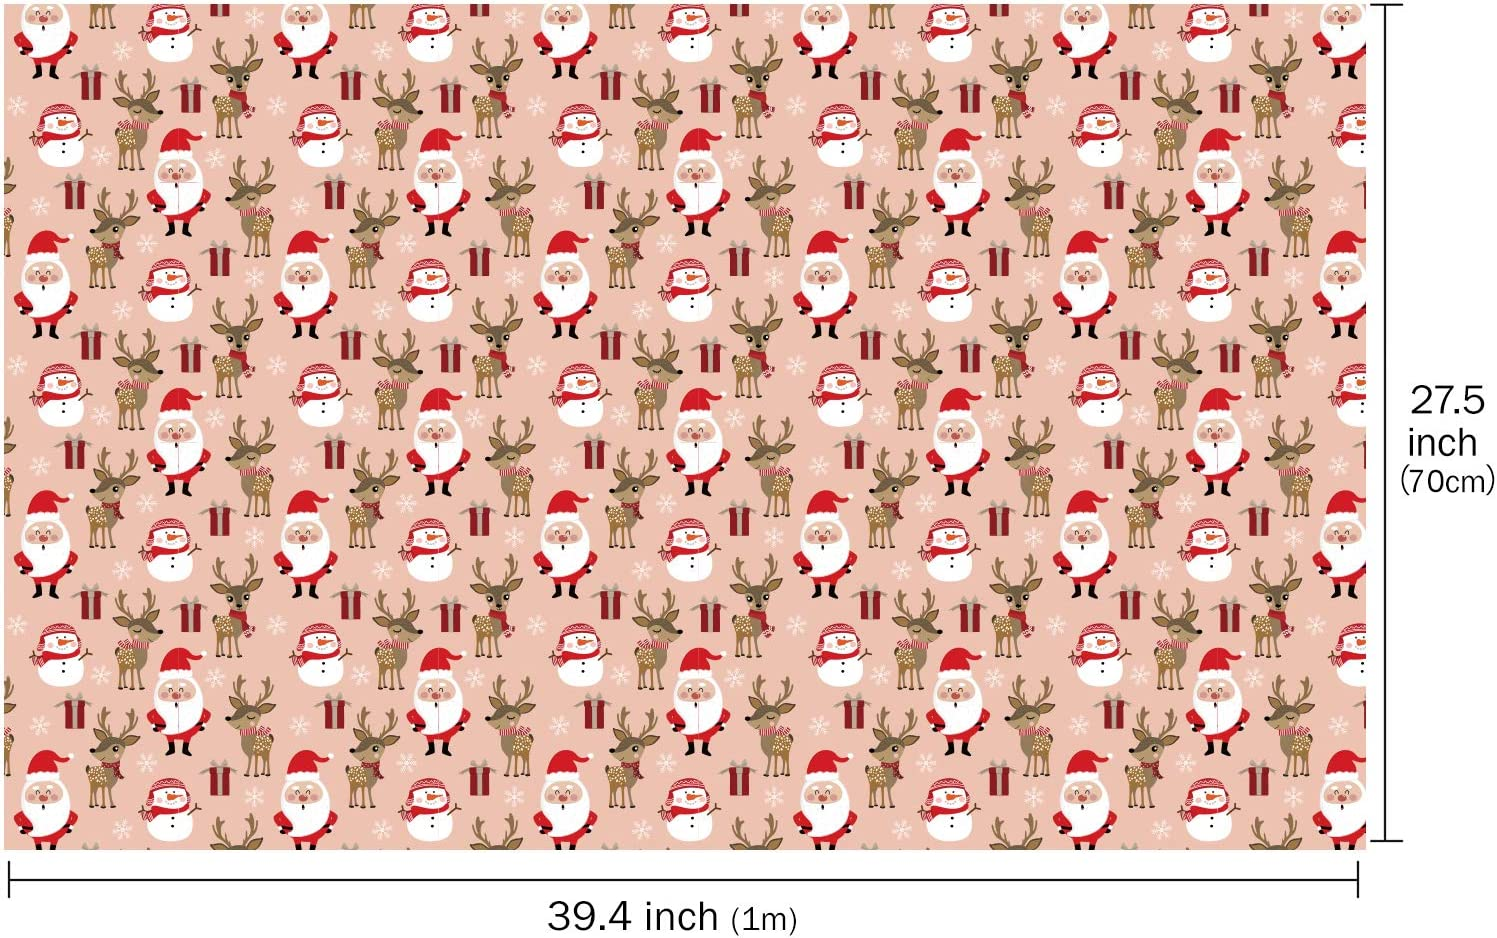 RUSPEPA Kraftpapierpapier Geschenkpapier Zum Geburtstag 3 Gefaltete Bl/ätter 70 cm X 1 m Zoll Pro Blatt